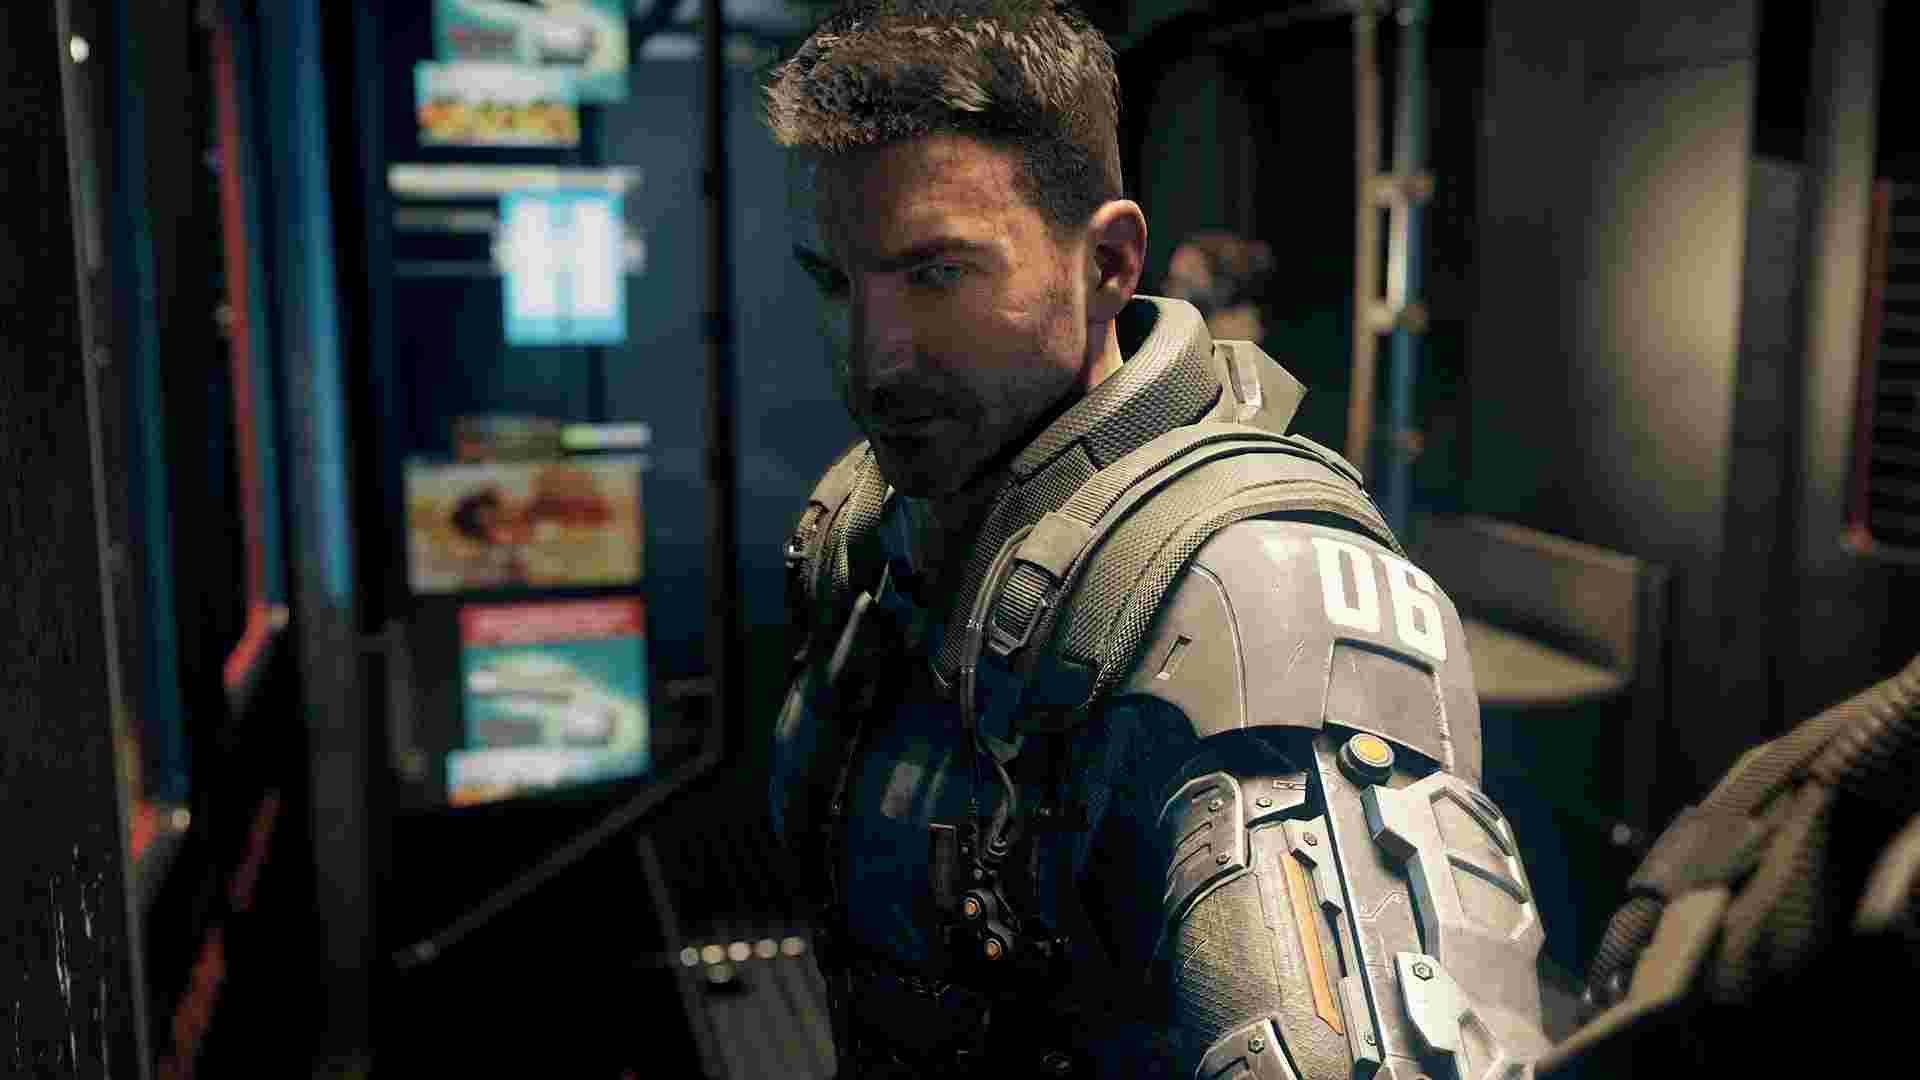 Ув очікуванні Call of Duty: Black Ops III   Прев'ю